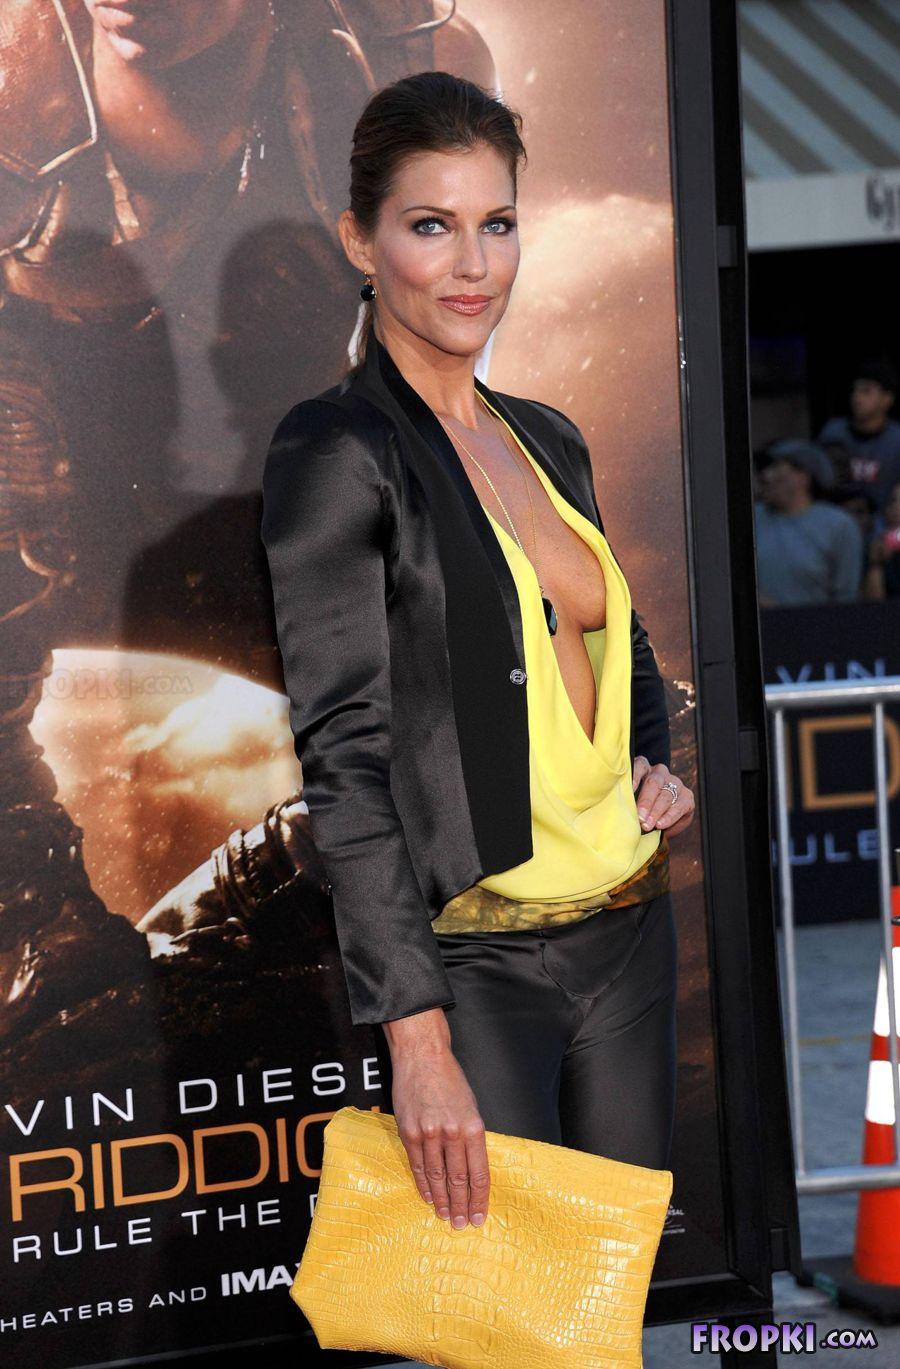 Tricia Helfer - Riddick Premiere in Los Angeles AbvgObGd